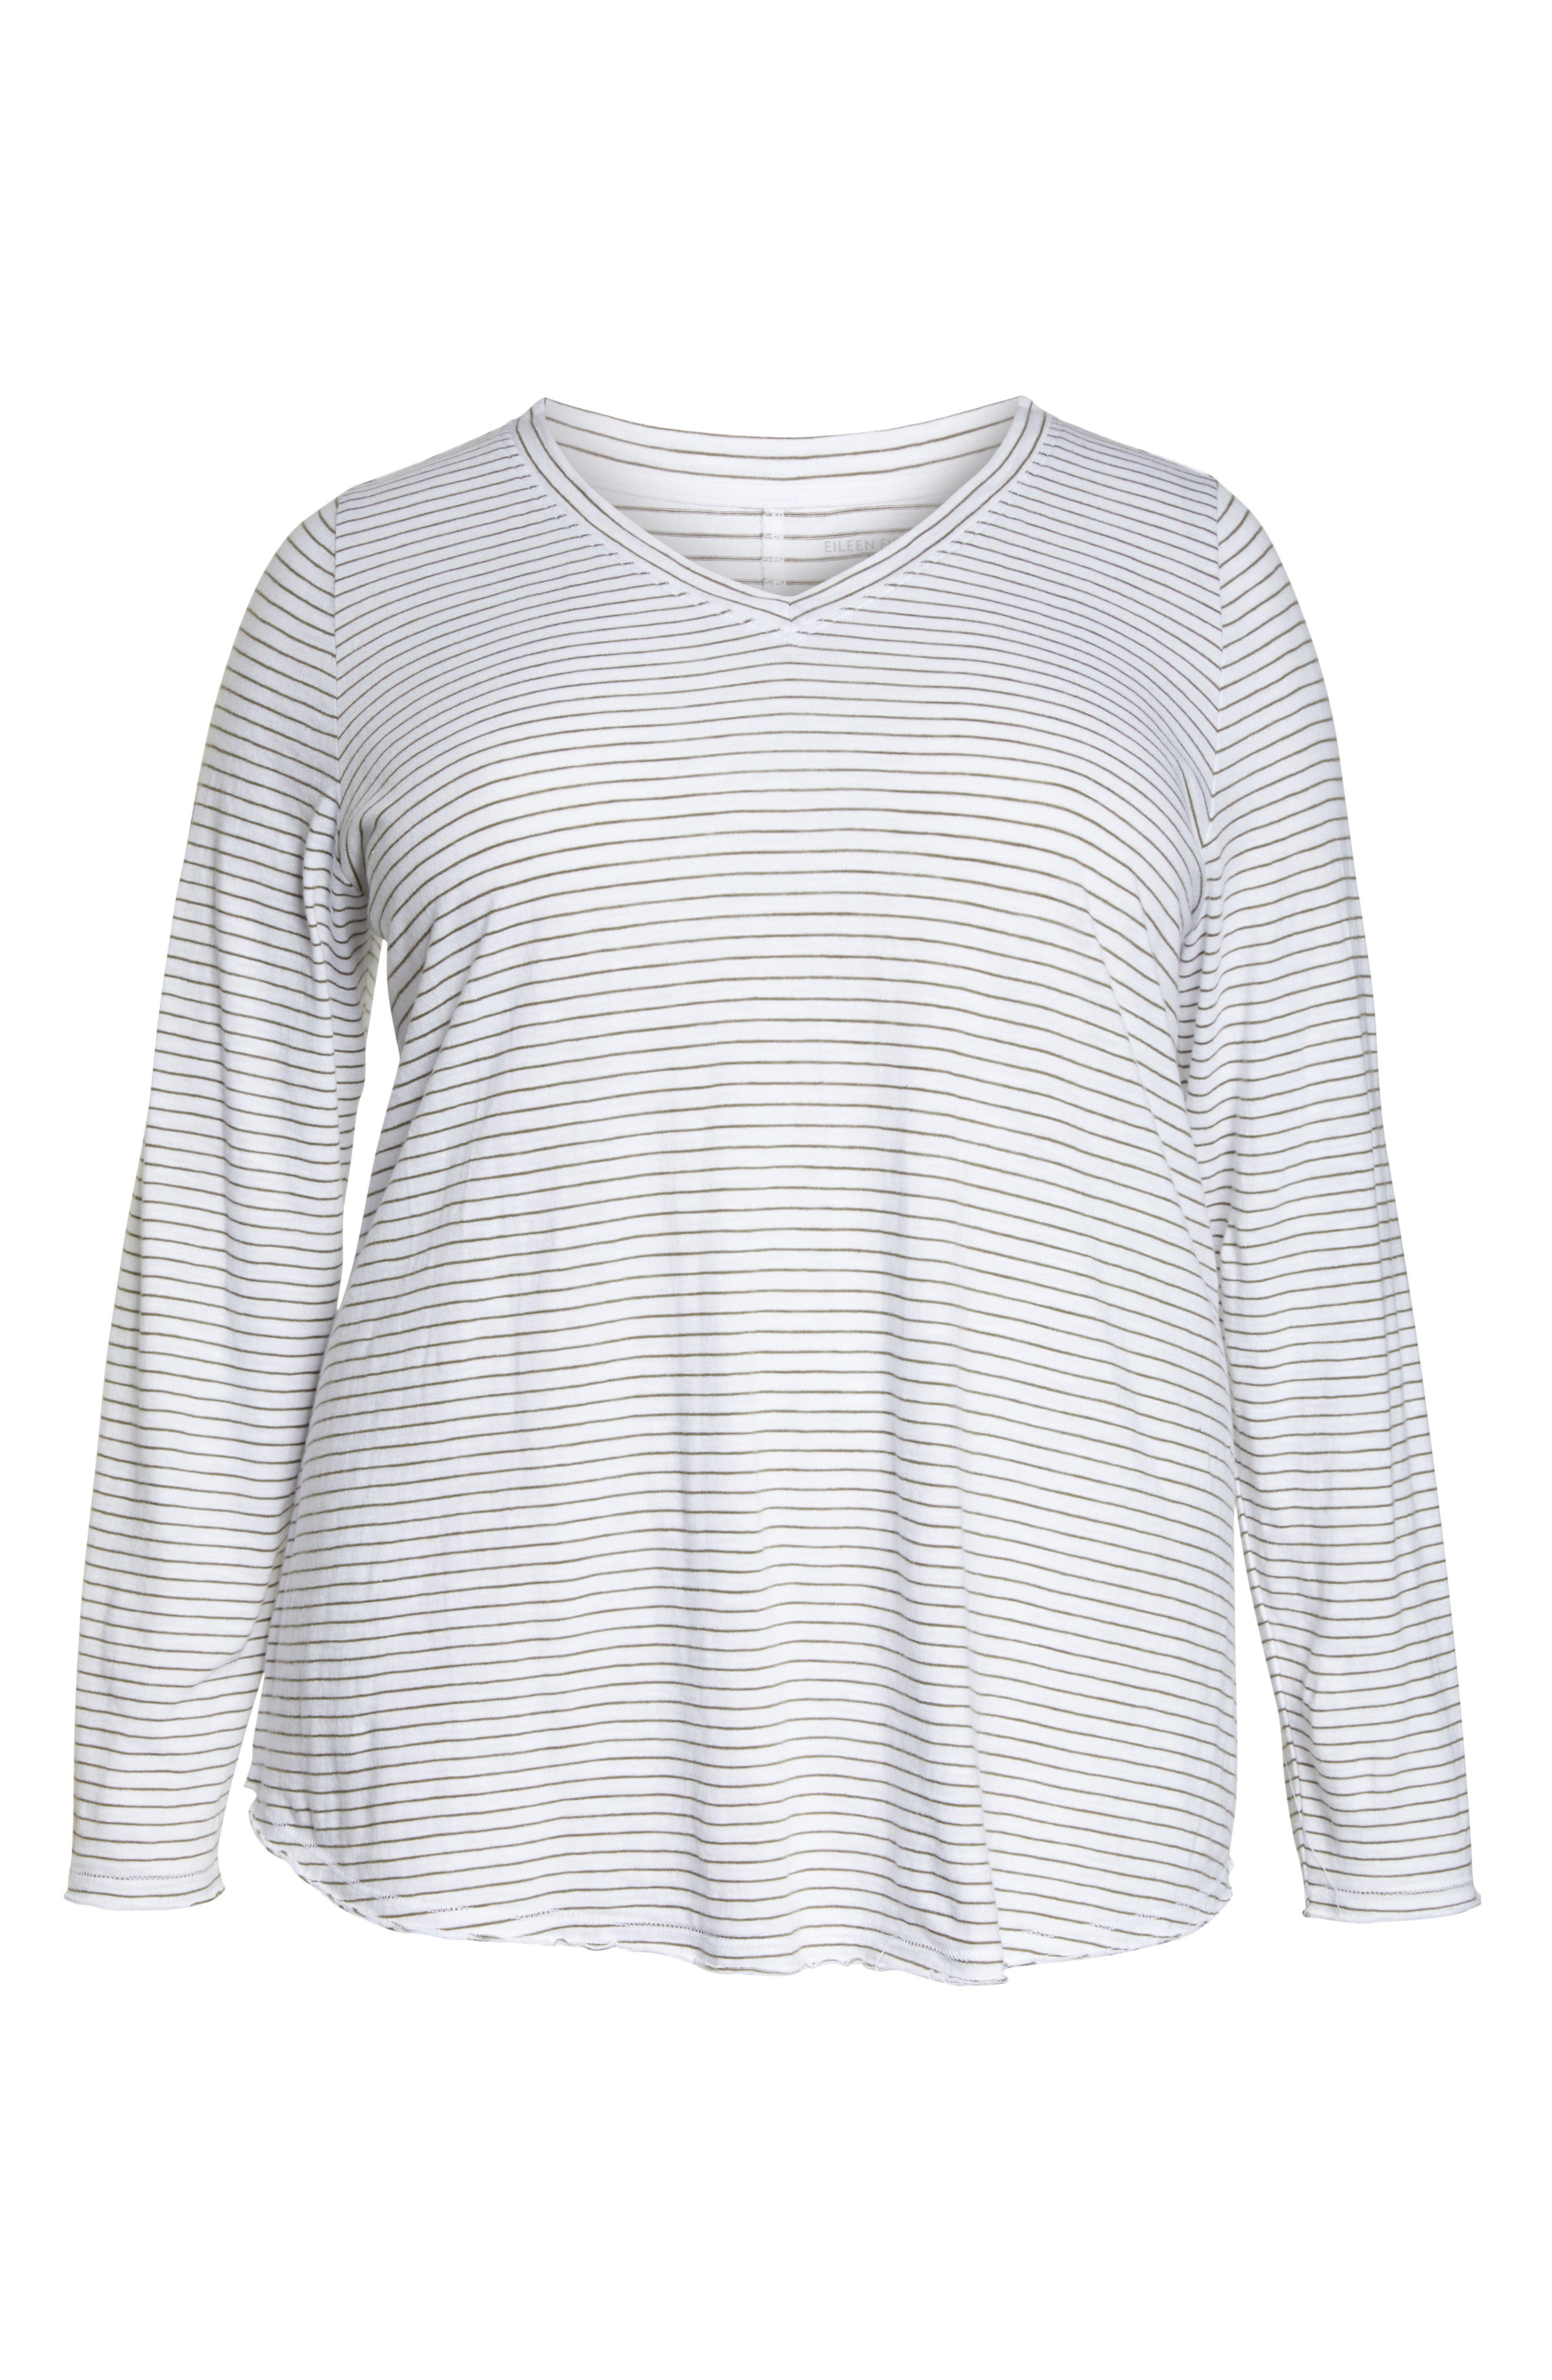 Stripe Organic Cotton V-Neck Tee,                             Alternate thumbnail 6, color,                             WHITE